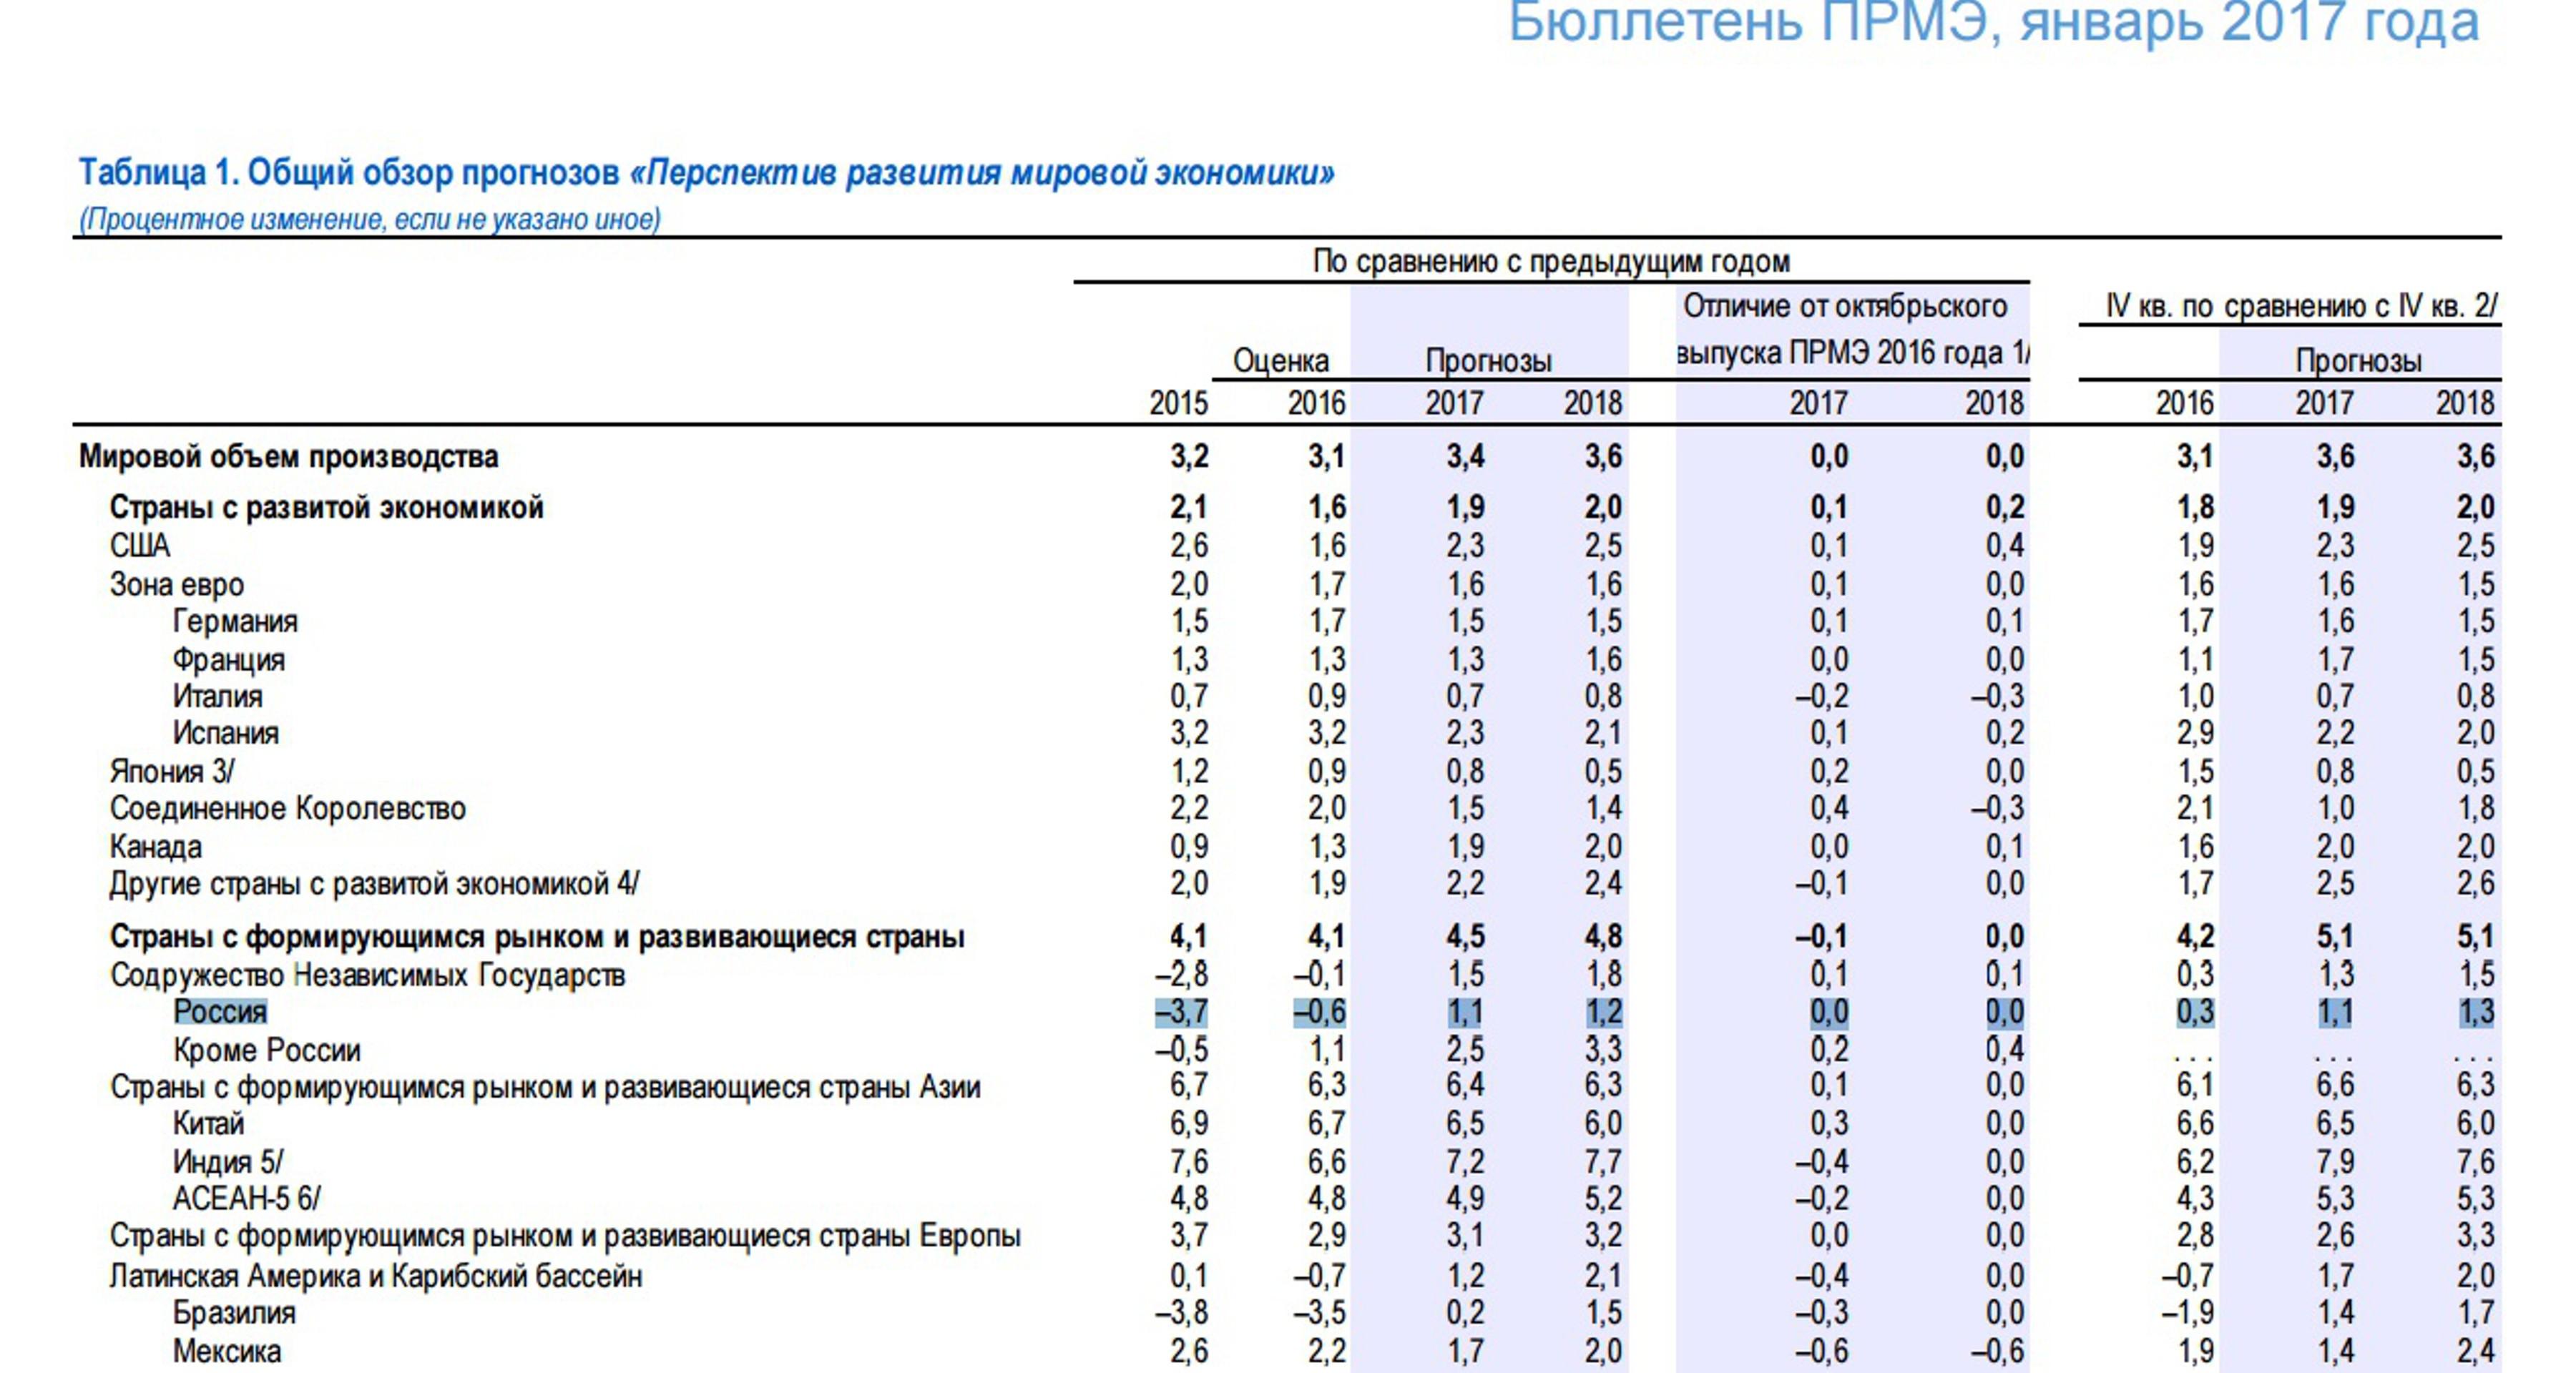 МВФ обновил прогноз по ВВП стран и цене нефти